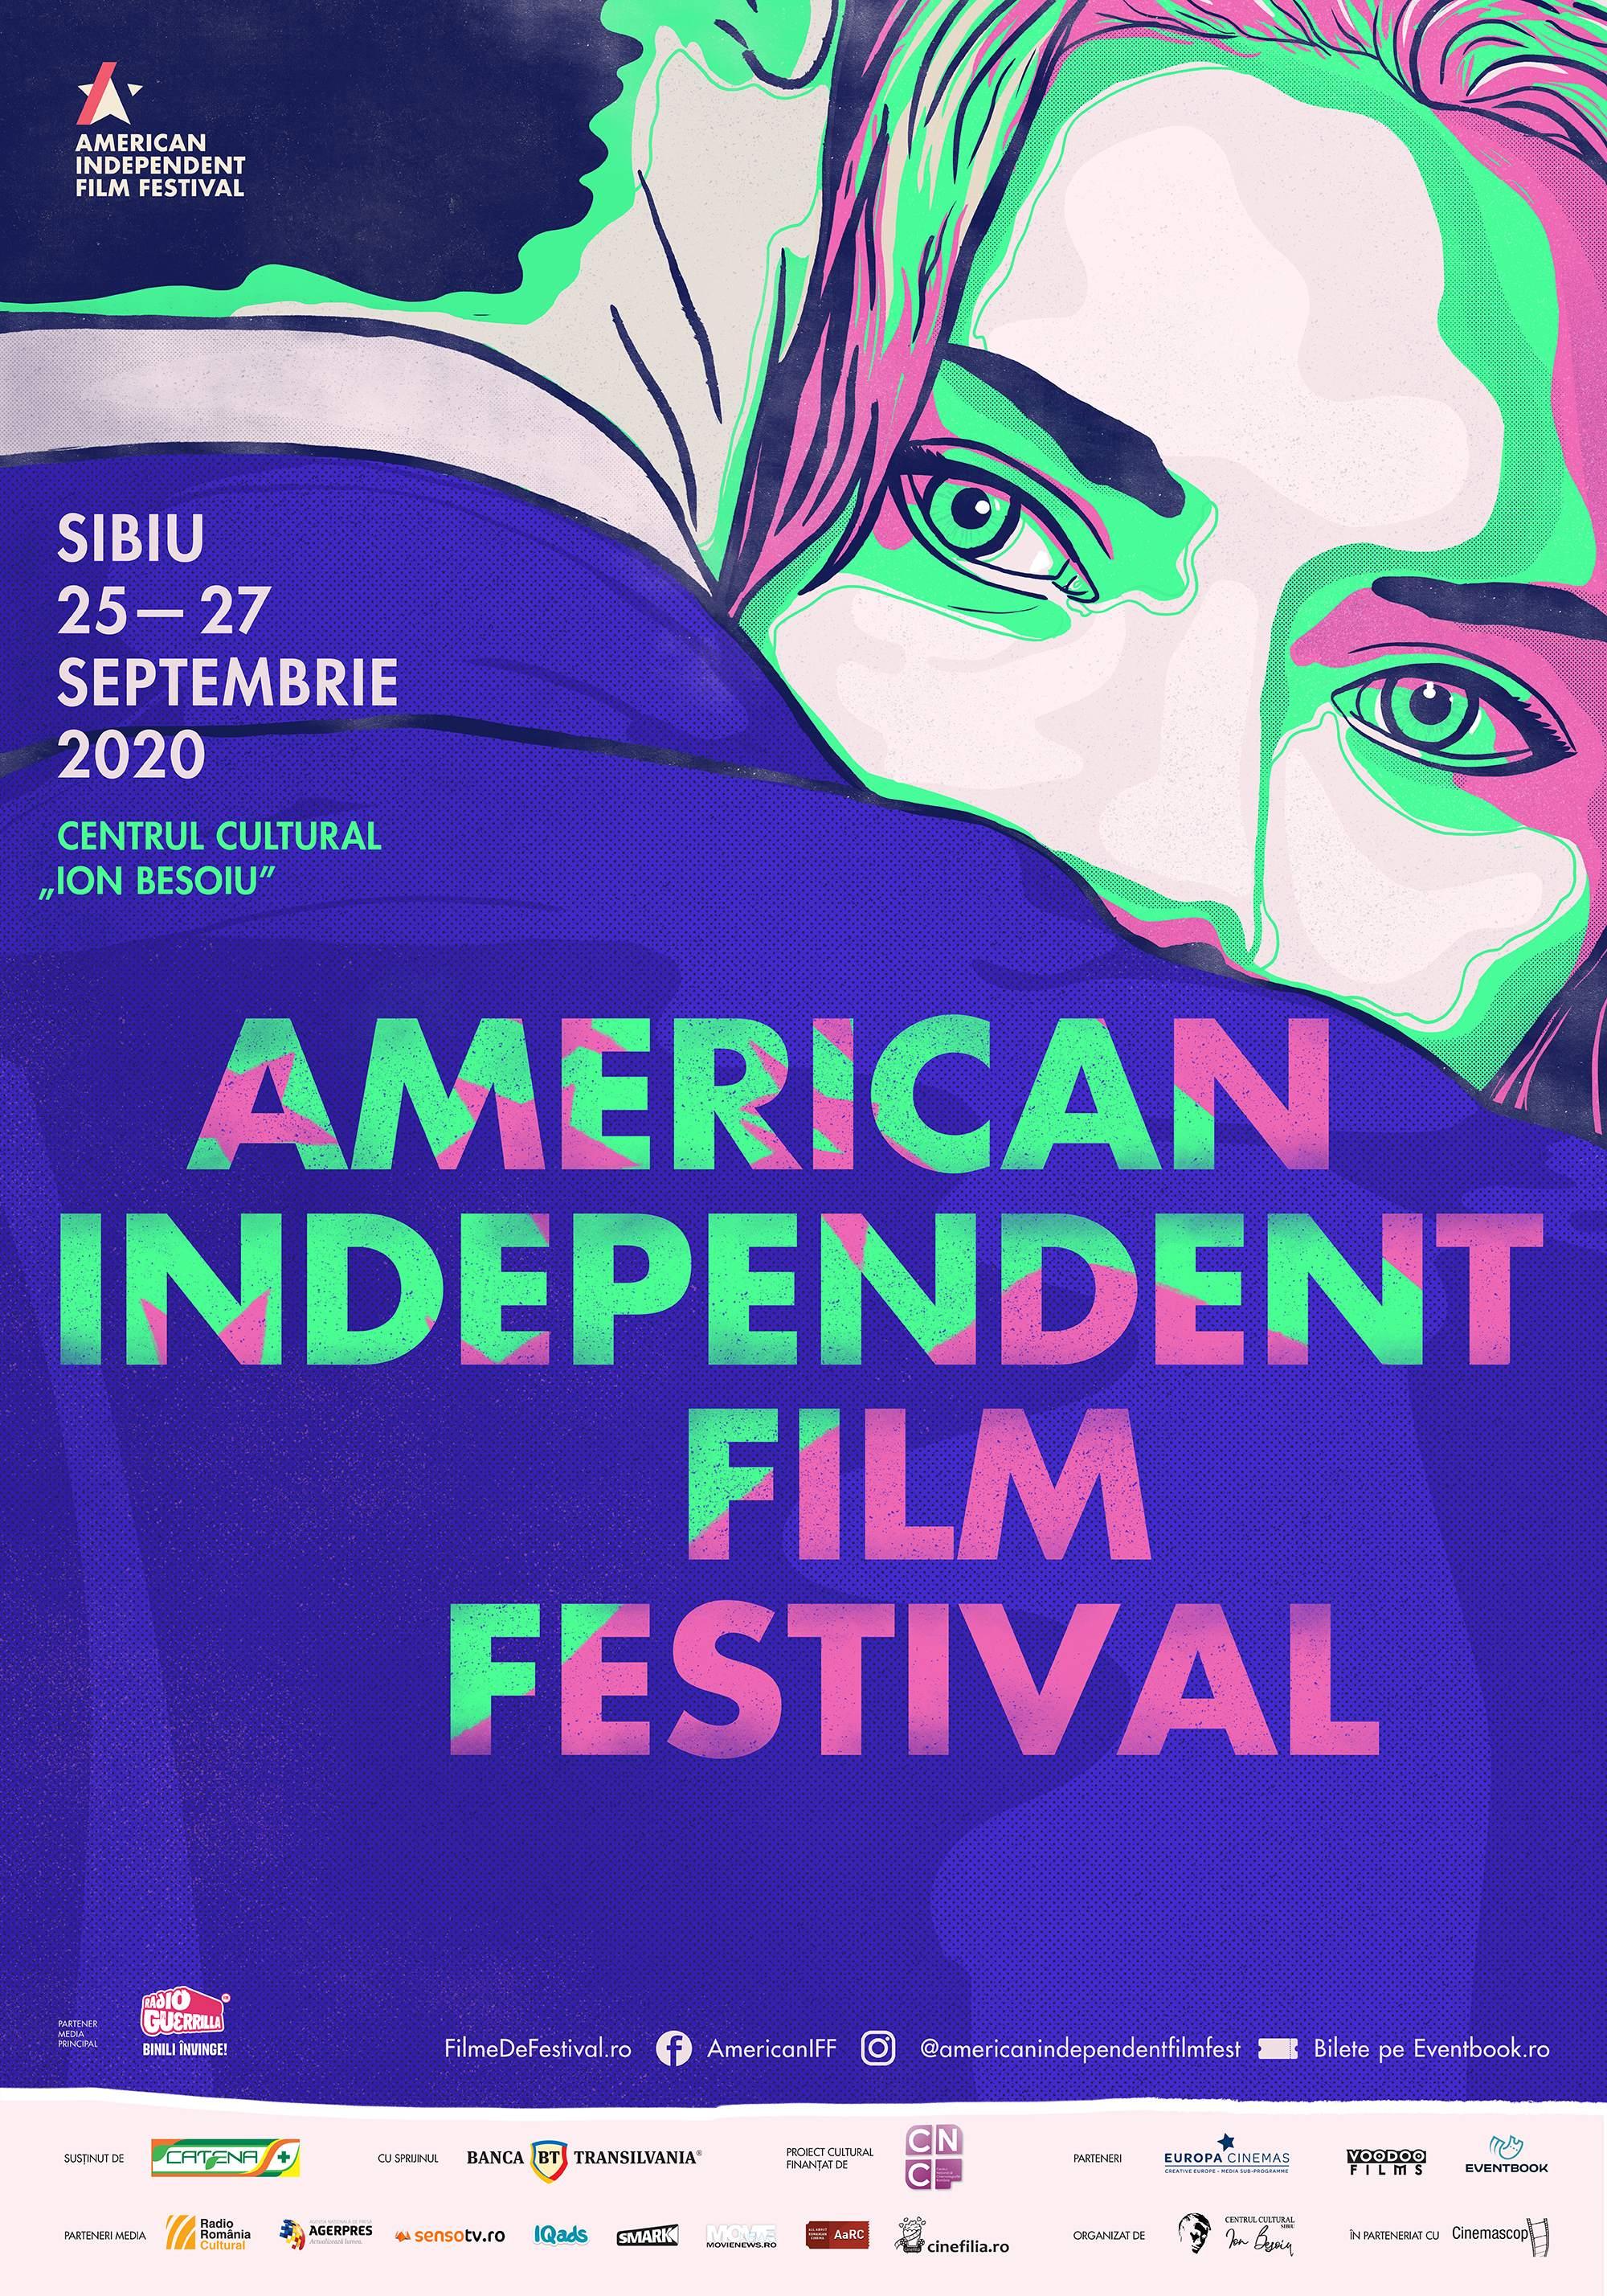 {focus_keyword} American Independent Film Festival vine la Sibiu (25-27 septembrie) AIFF20SB poster  1